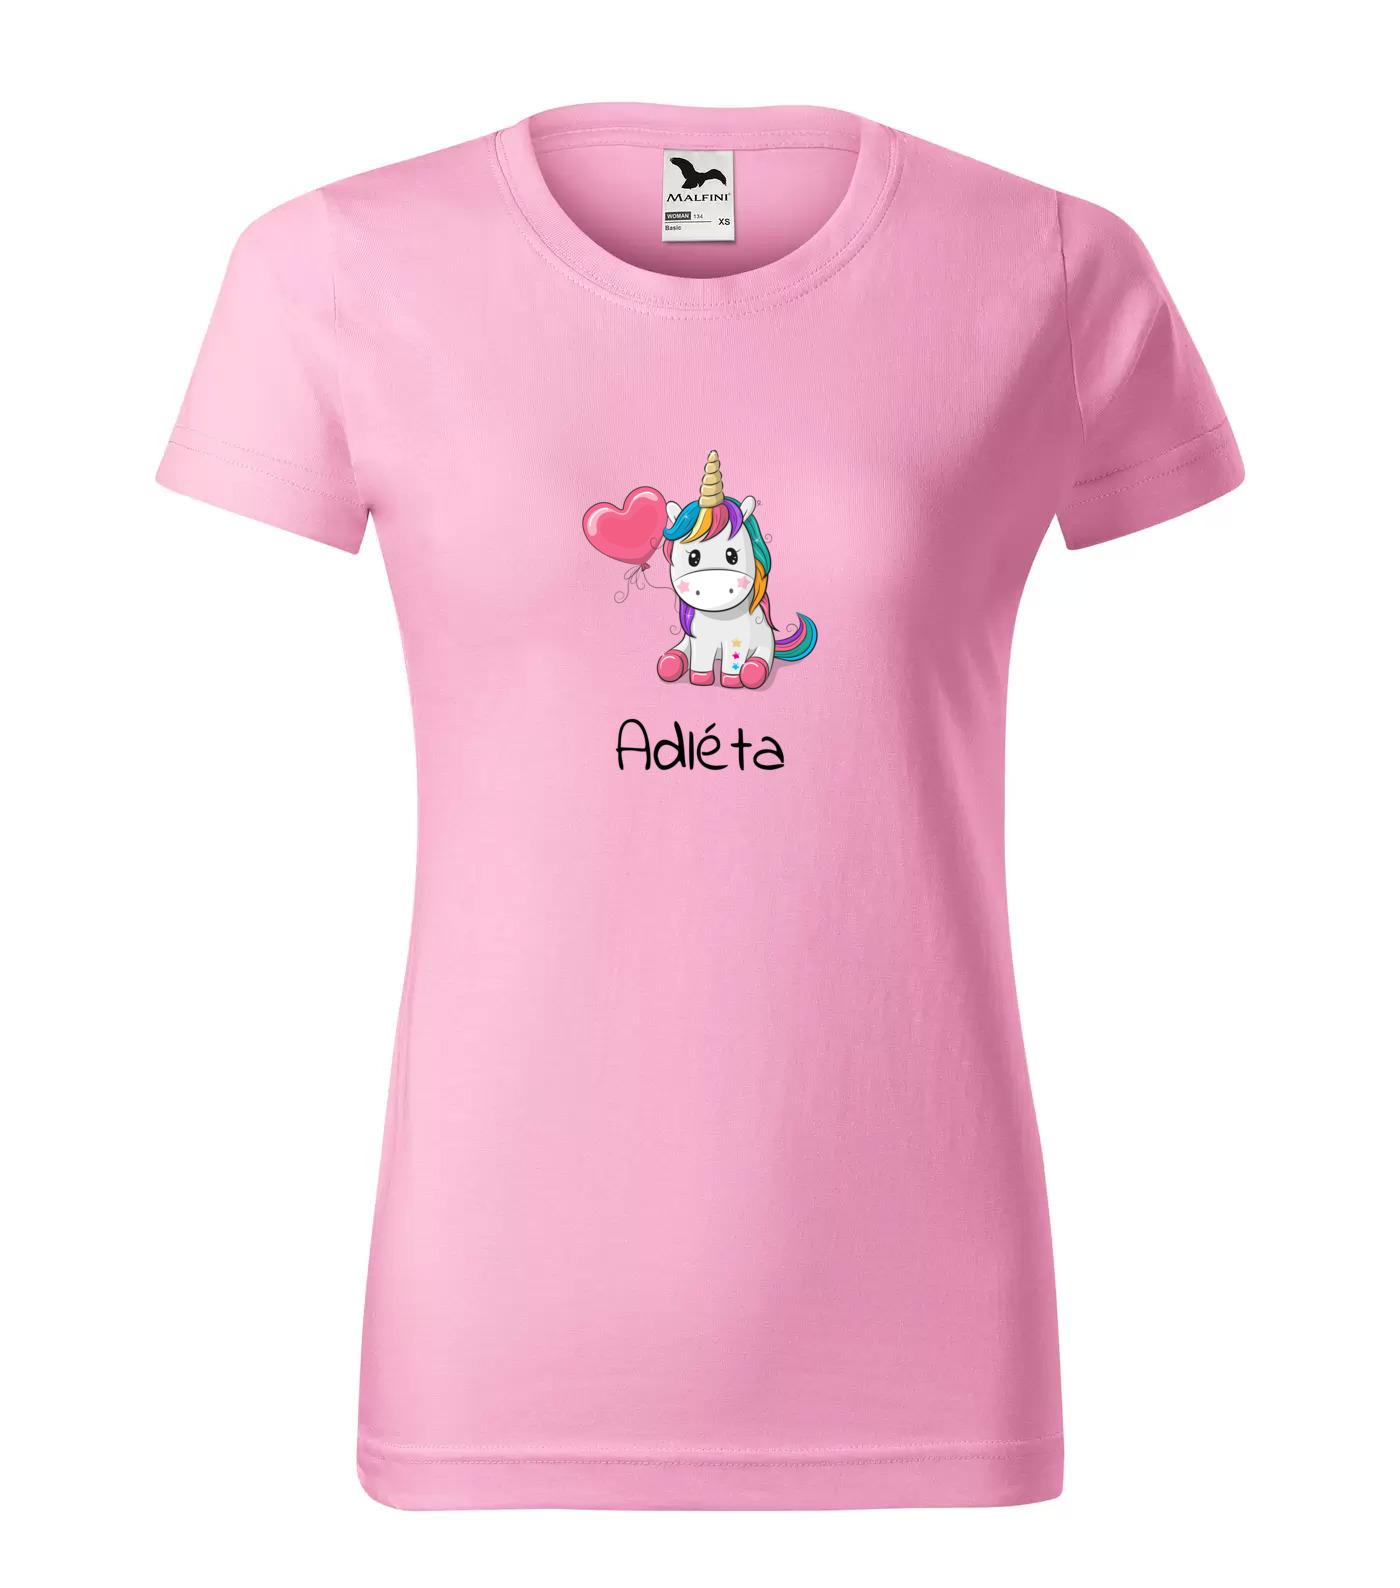 Tričko Jednorožec Adléta